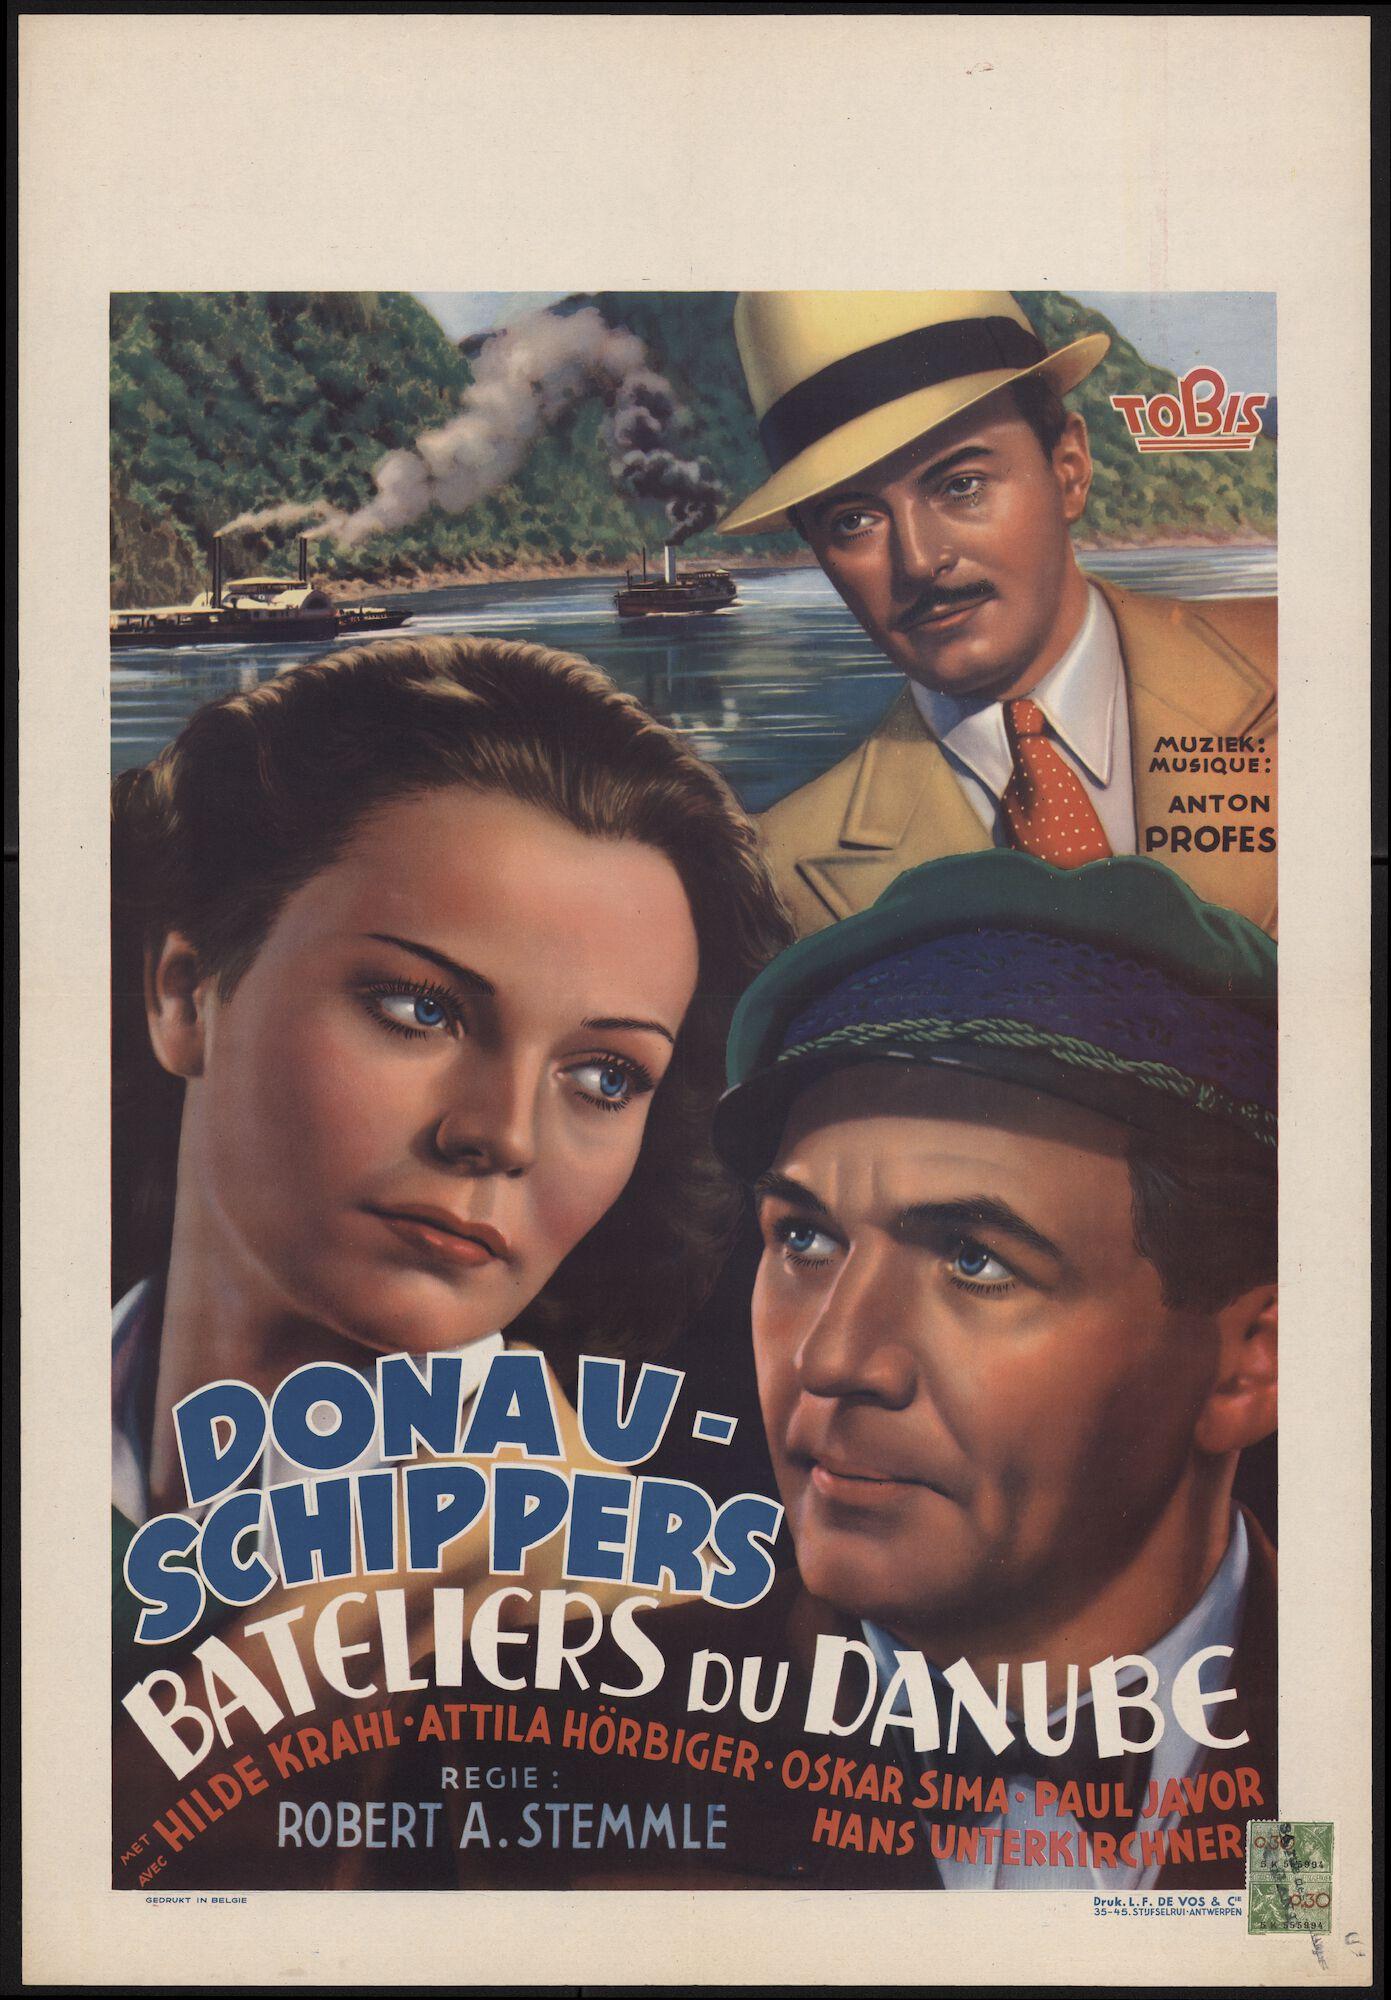 Donau-schippers | Bateliers du Danube, [Majestic], Gent, 1942